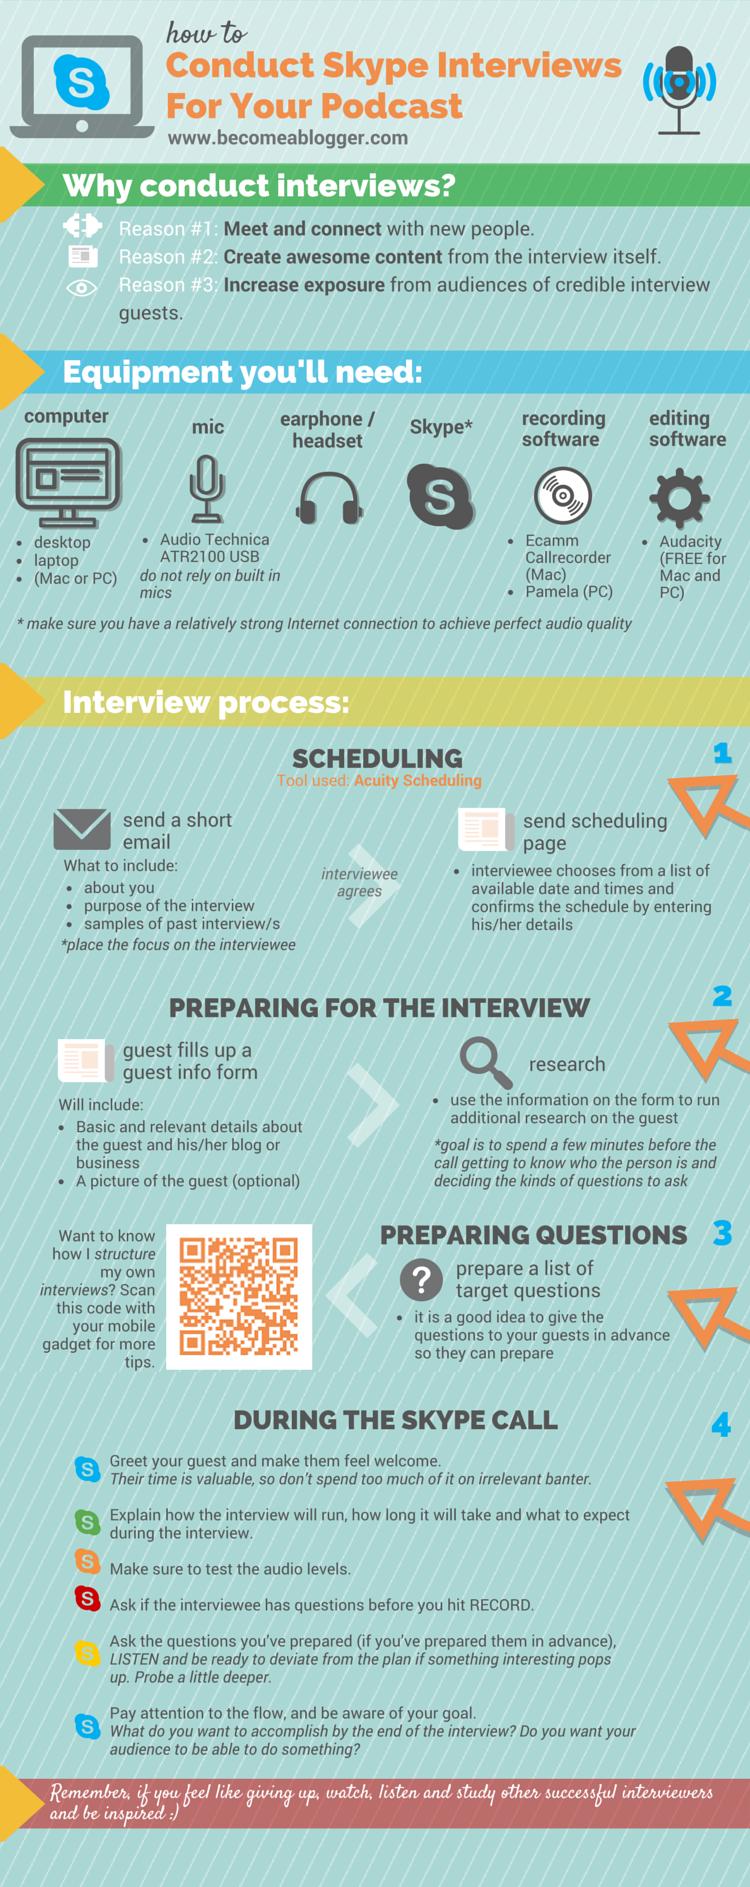 214_Skype_Interviews_Infographic